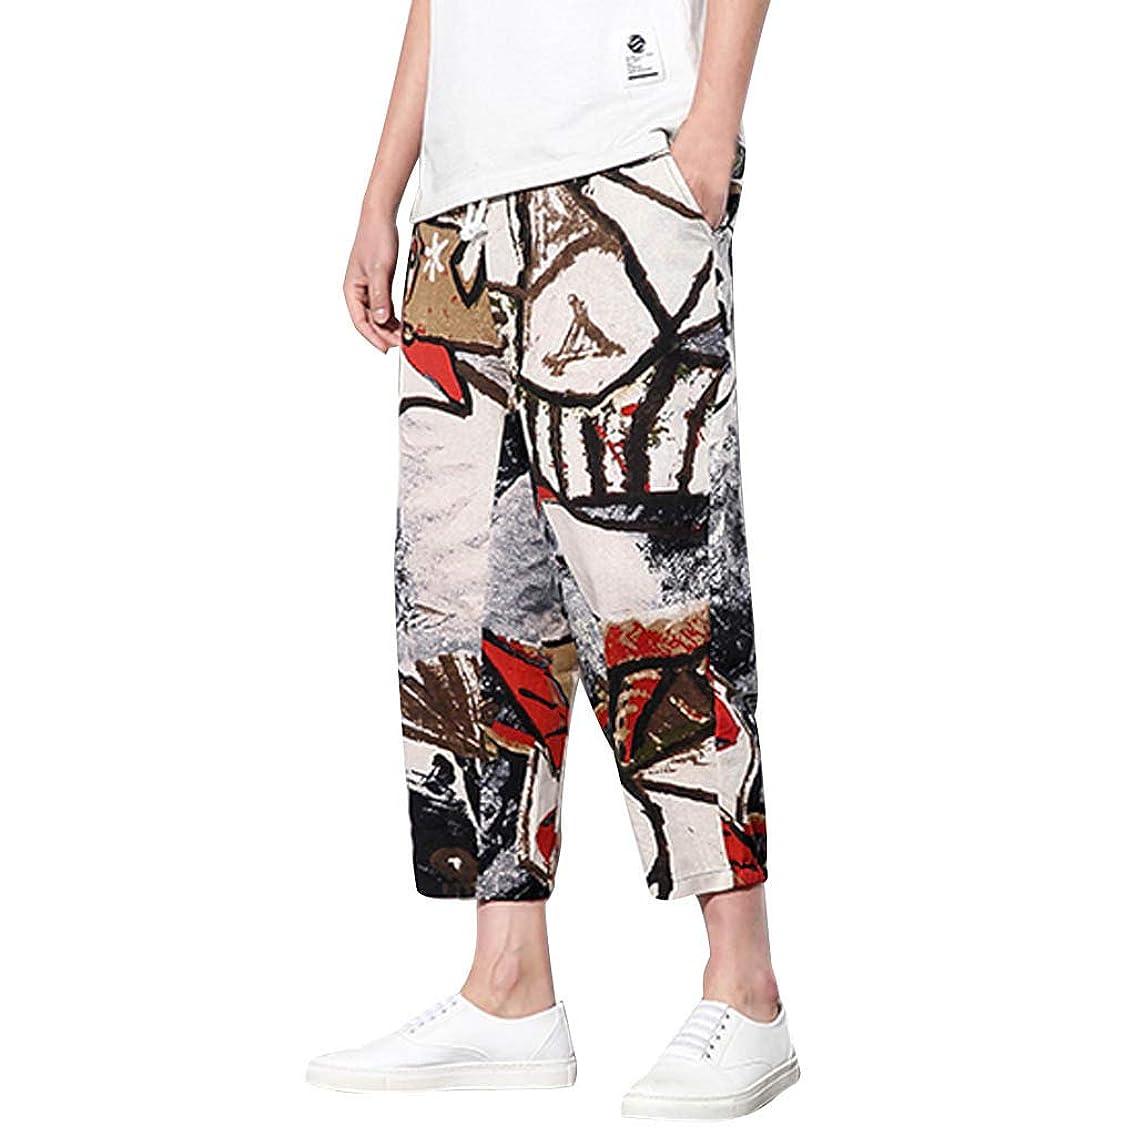 LEERYAAY Trunk&Short Men's Summer Fashion Leisure Ethnic Style Printing Linen Loose Ankle-Length Pant